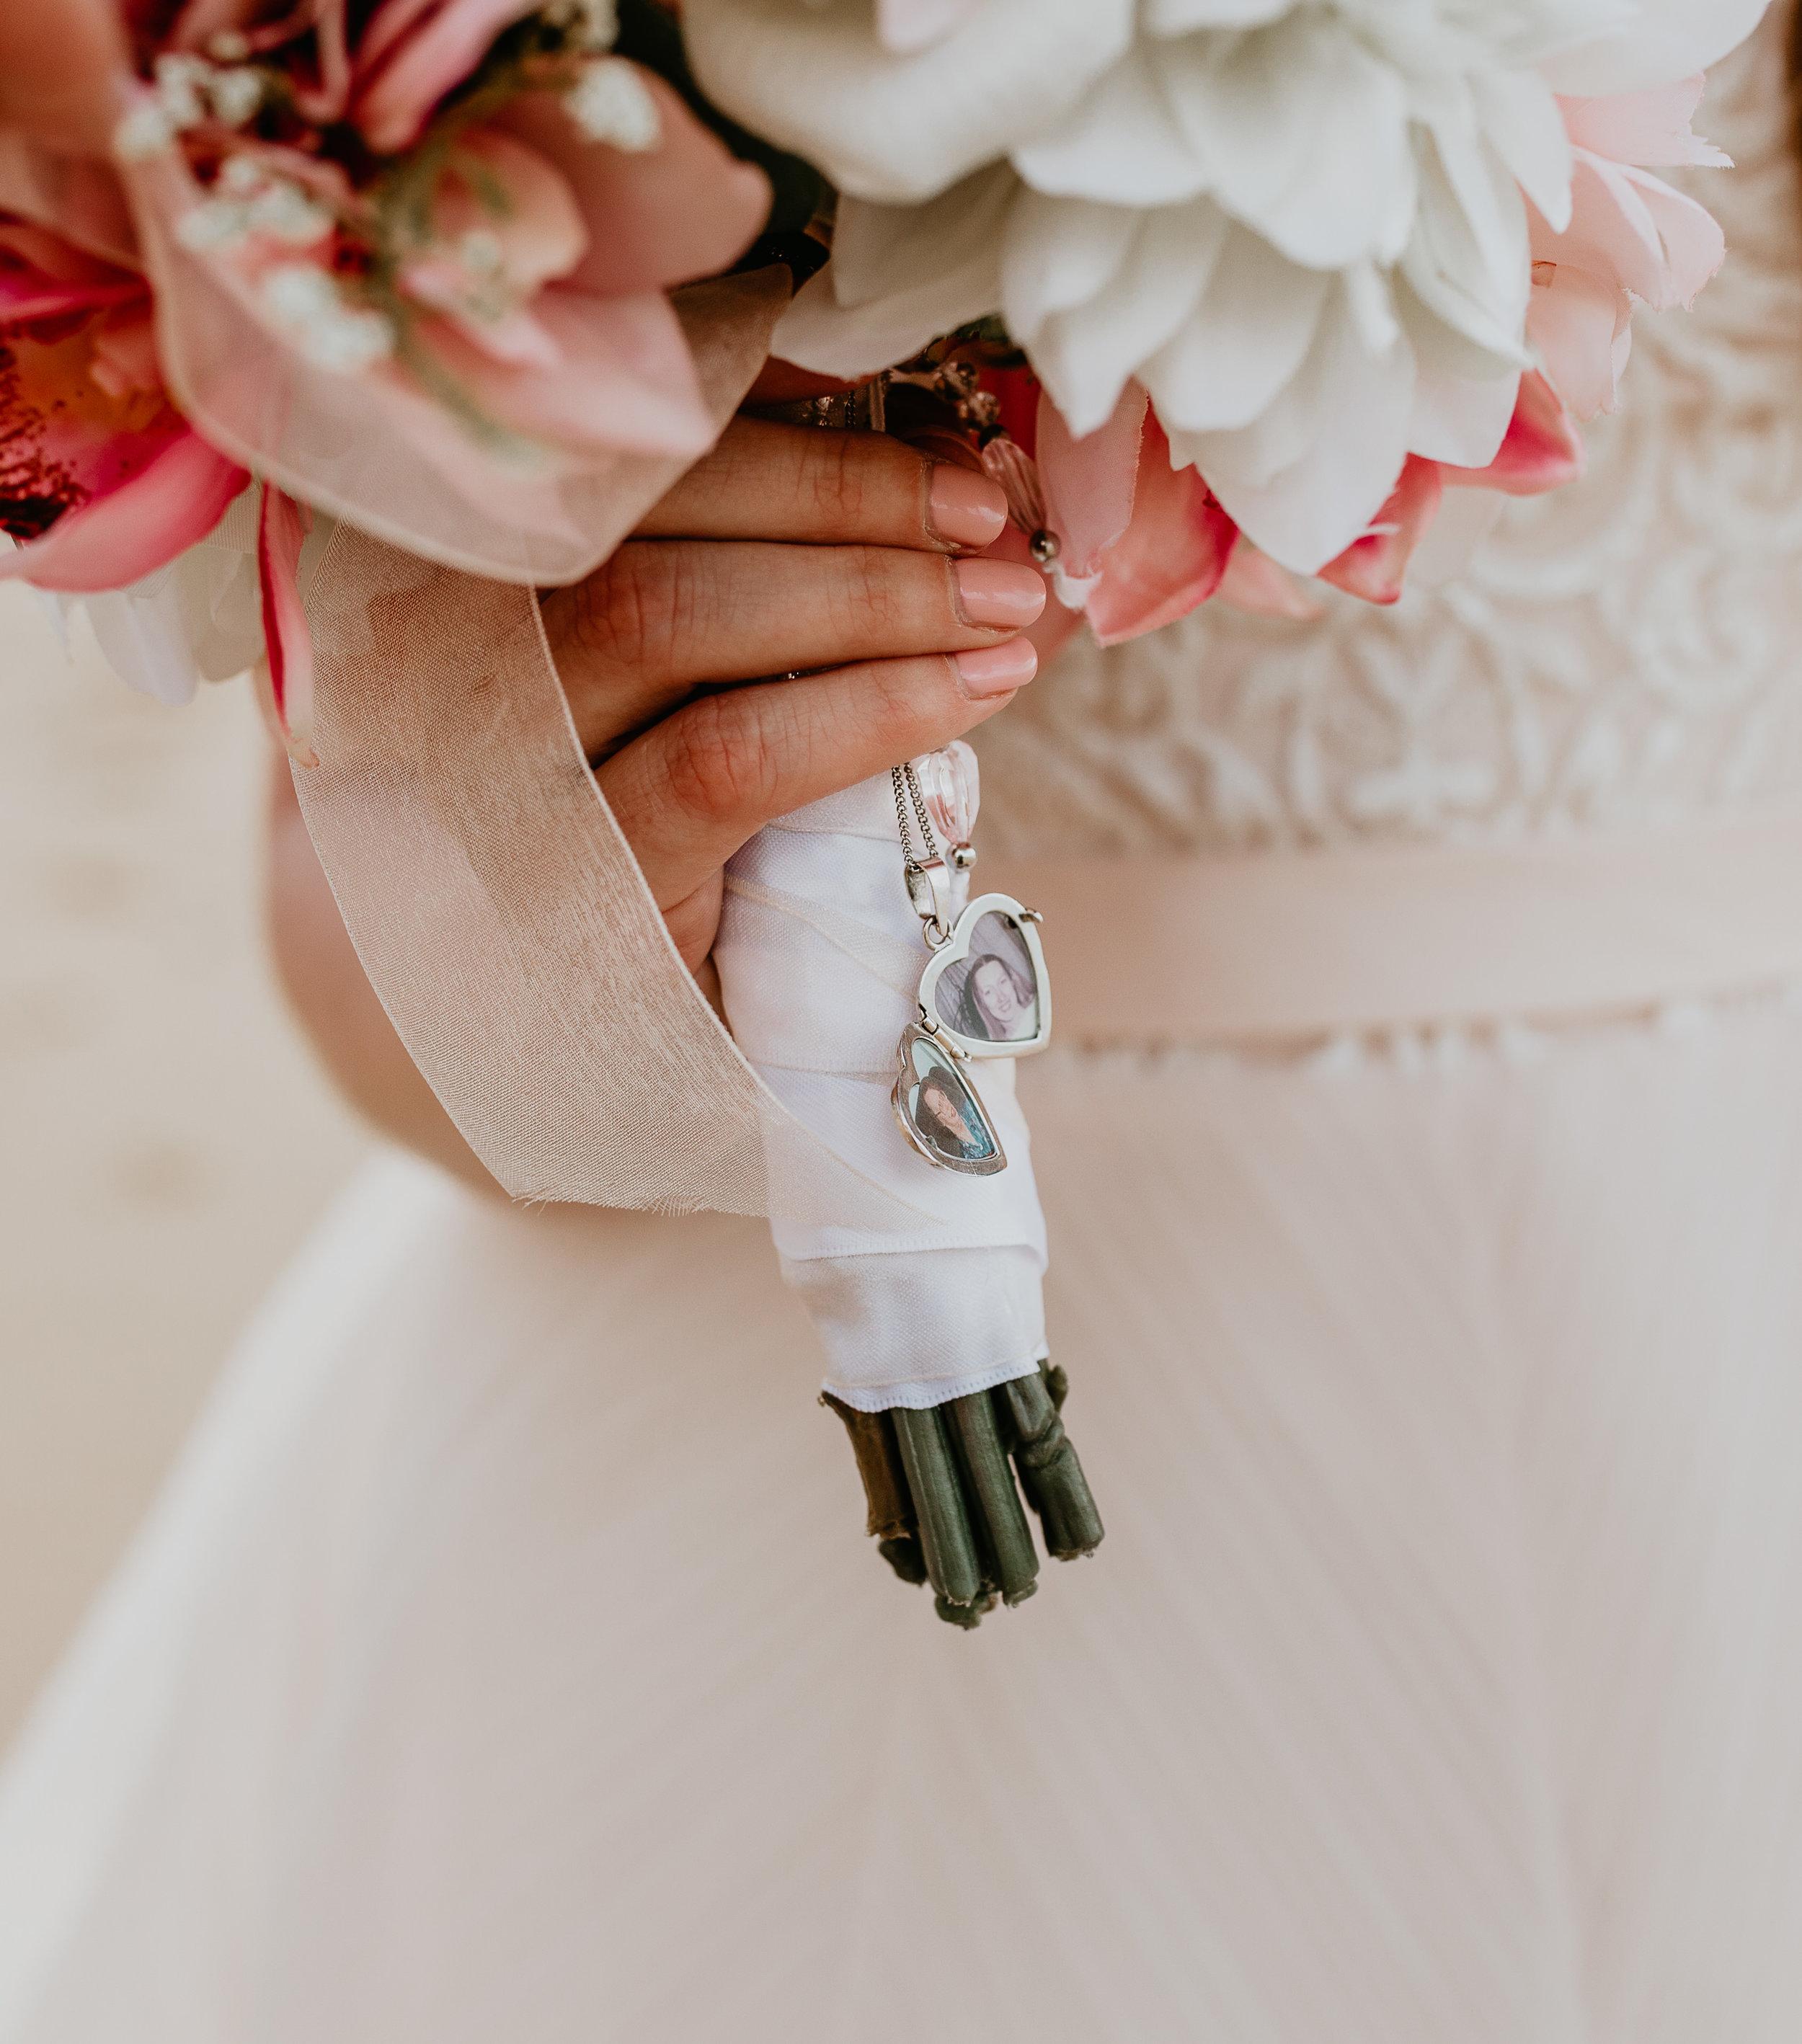 nicole-daacke-photography-destination-wedding-in-st-lucia-sandals-la-toc-intimate-island-wedding-carribean-elopement-photographer-chill-island-wedding-89.jpg